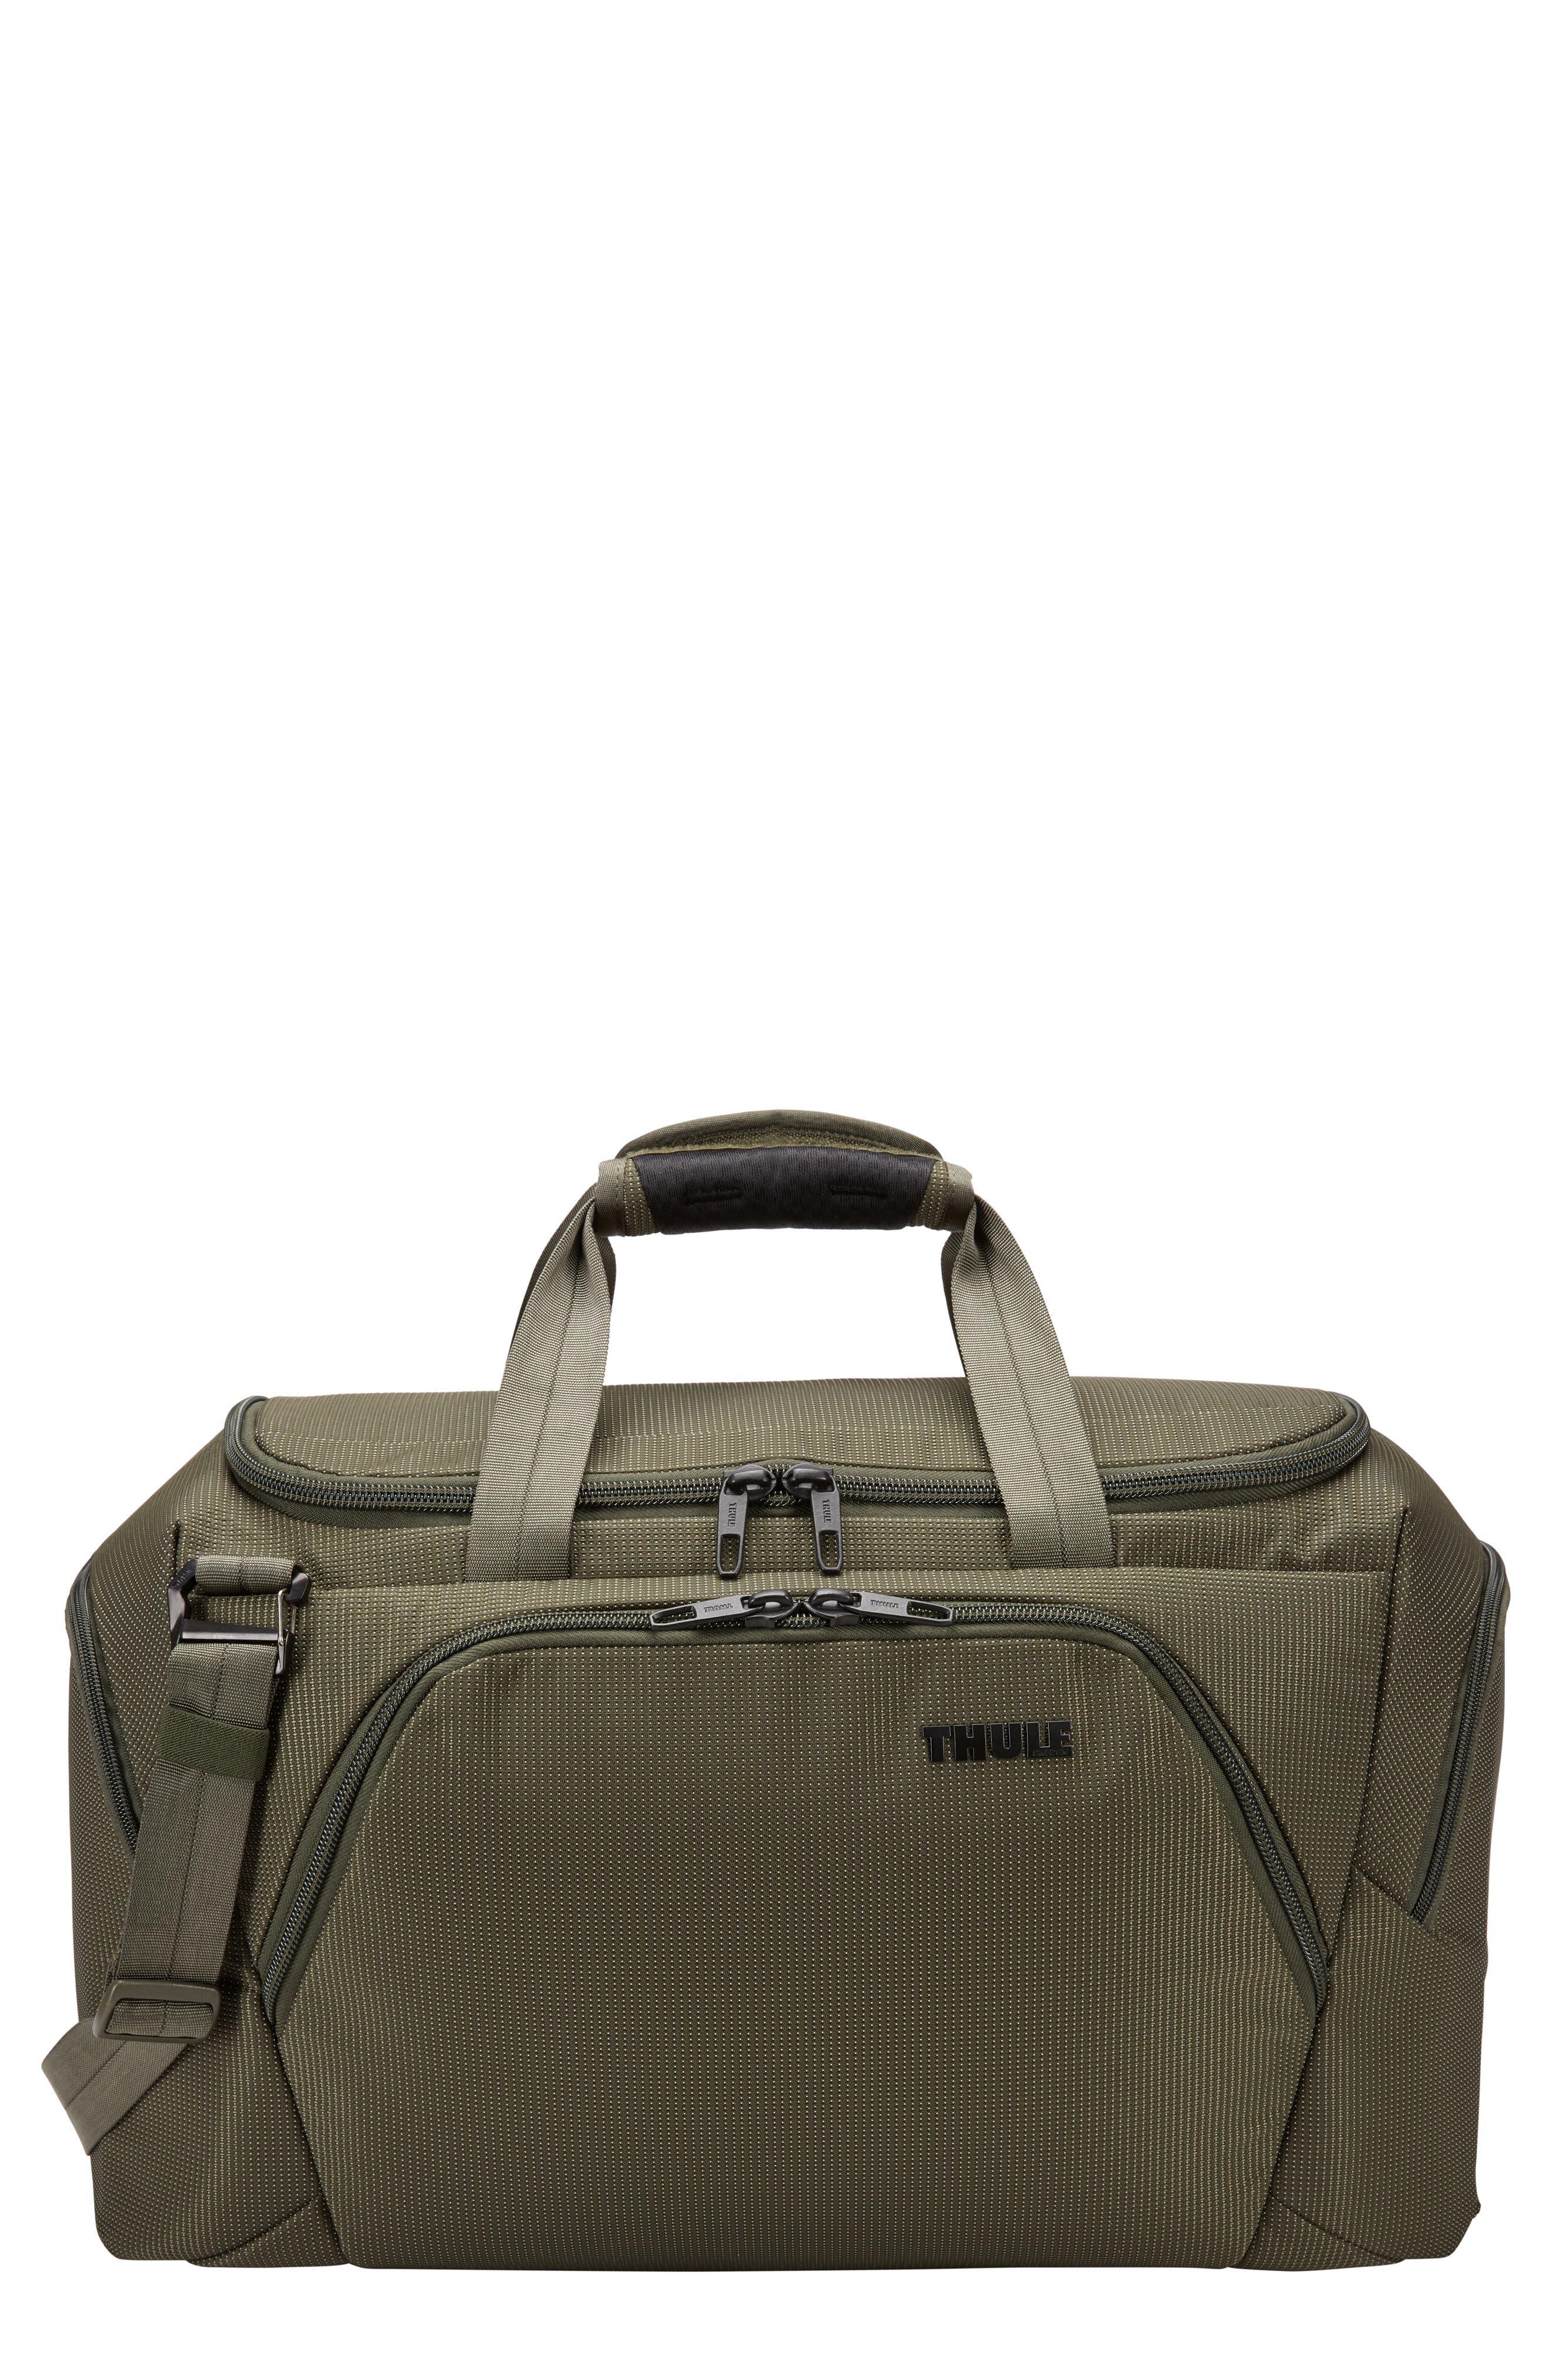 Thule Crossover 2 Duffle Bag